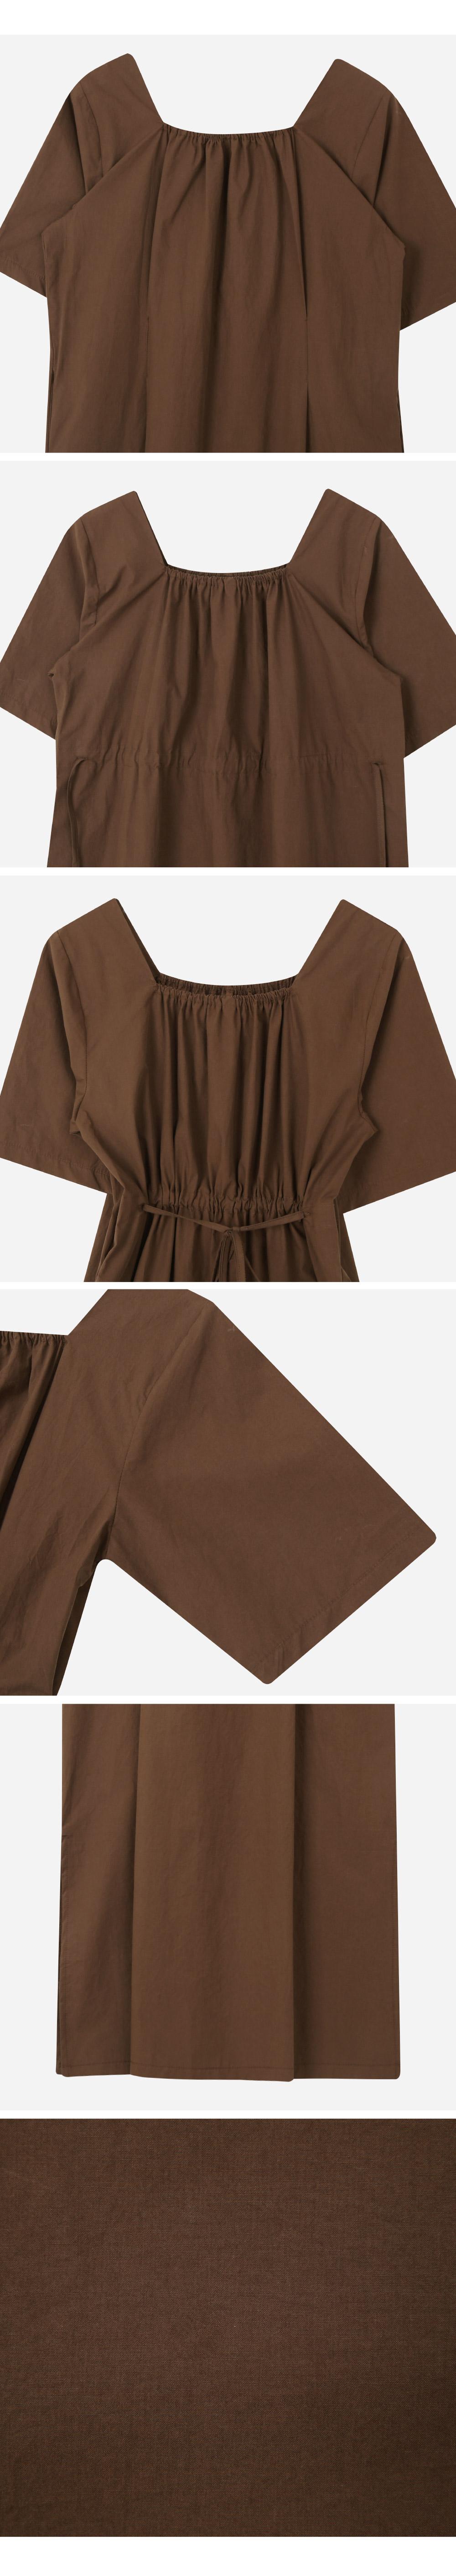 Cope Square Dress